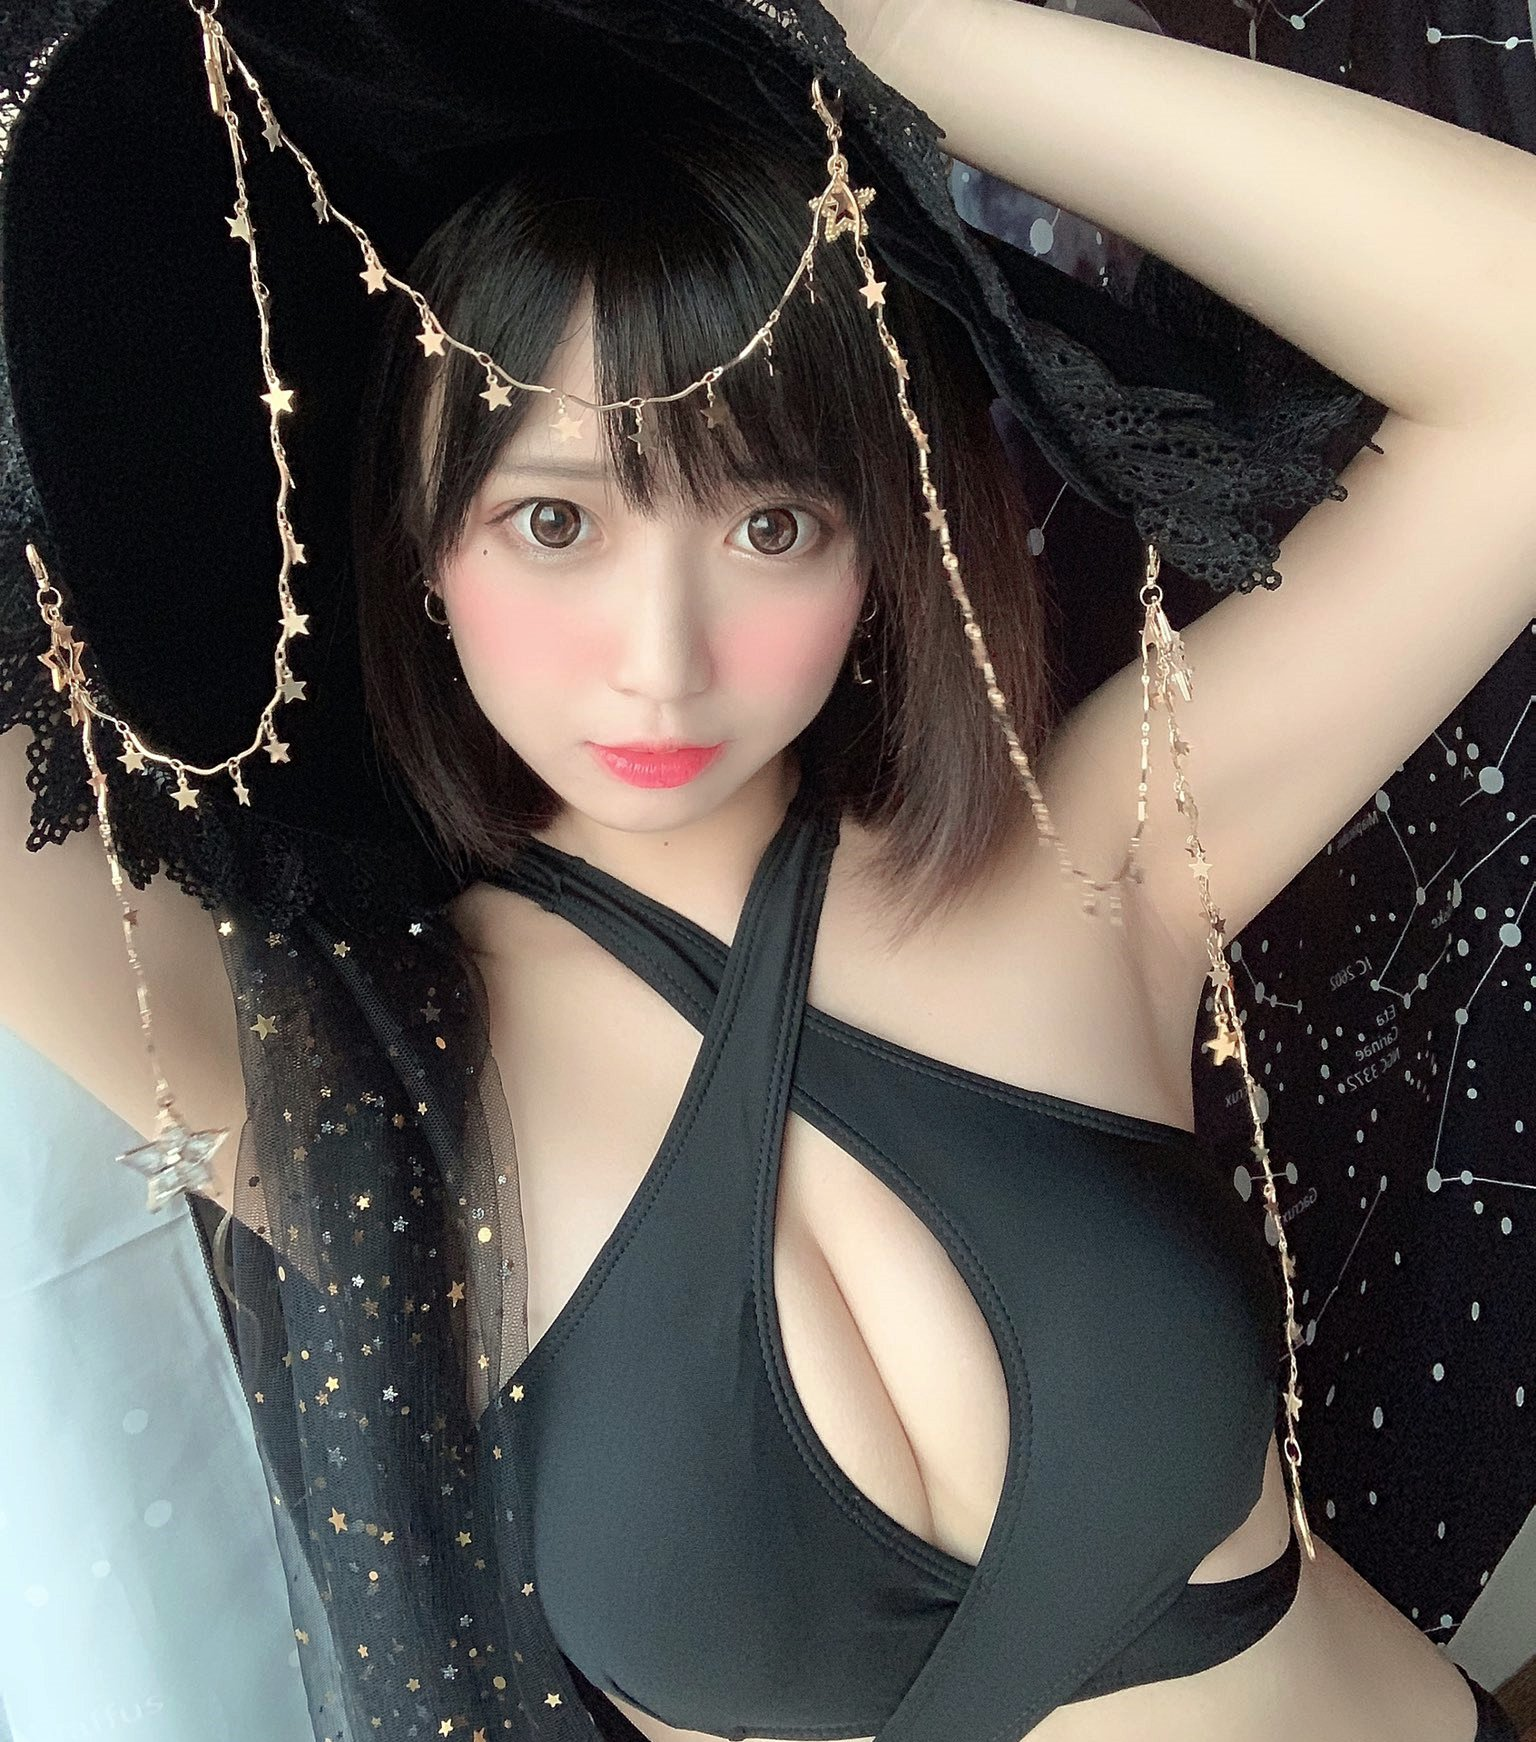 yamiの美腋 (2)